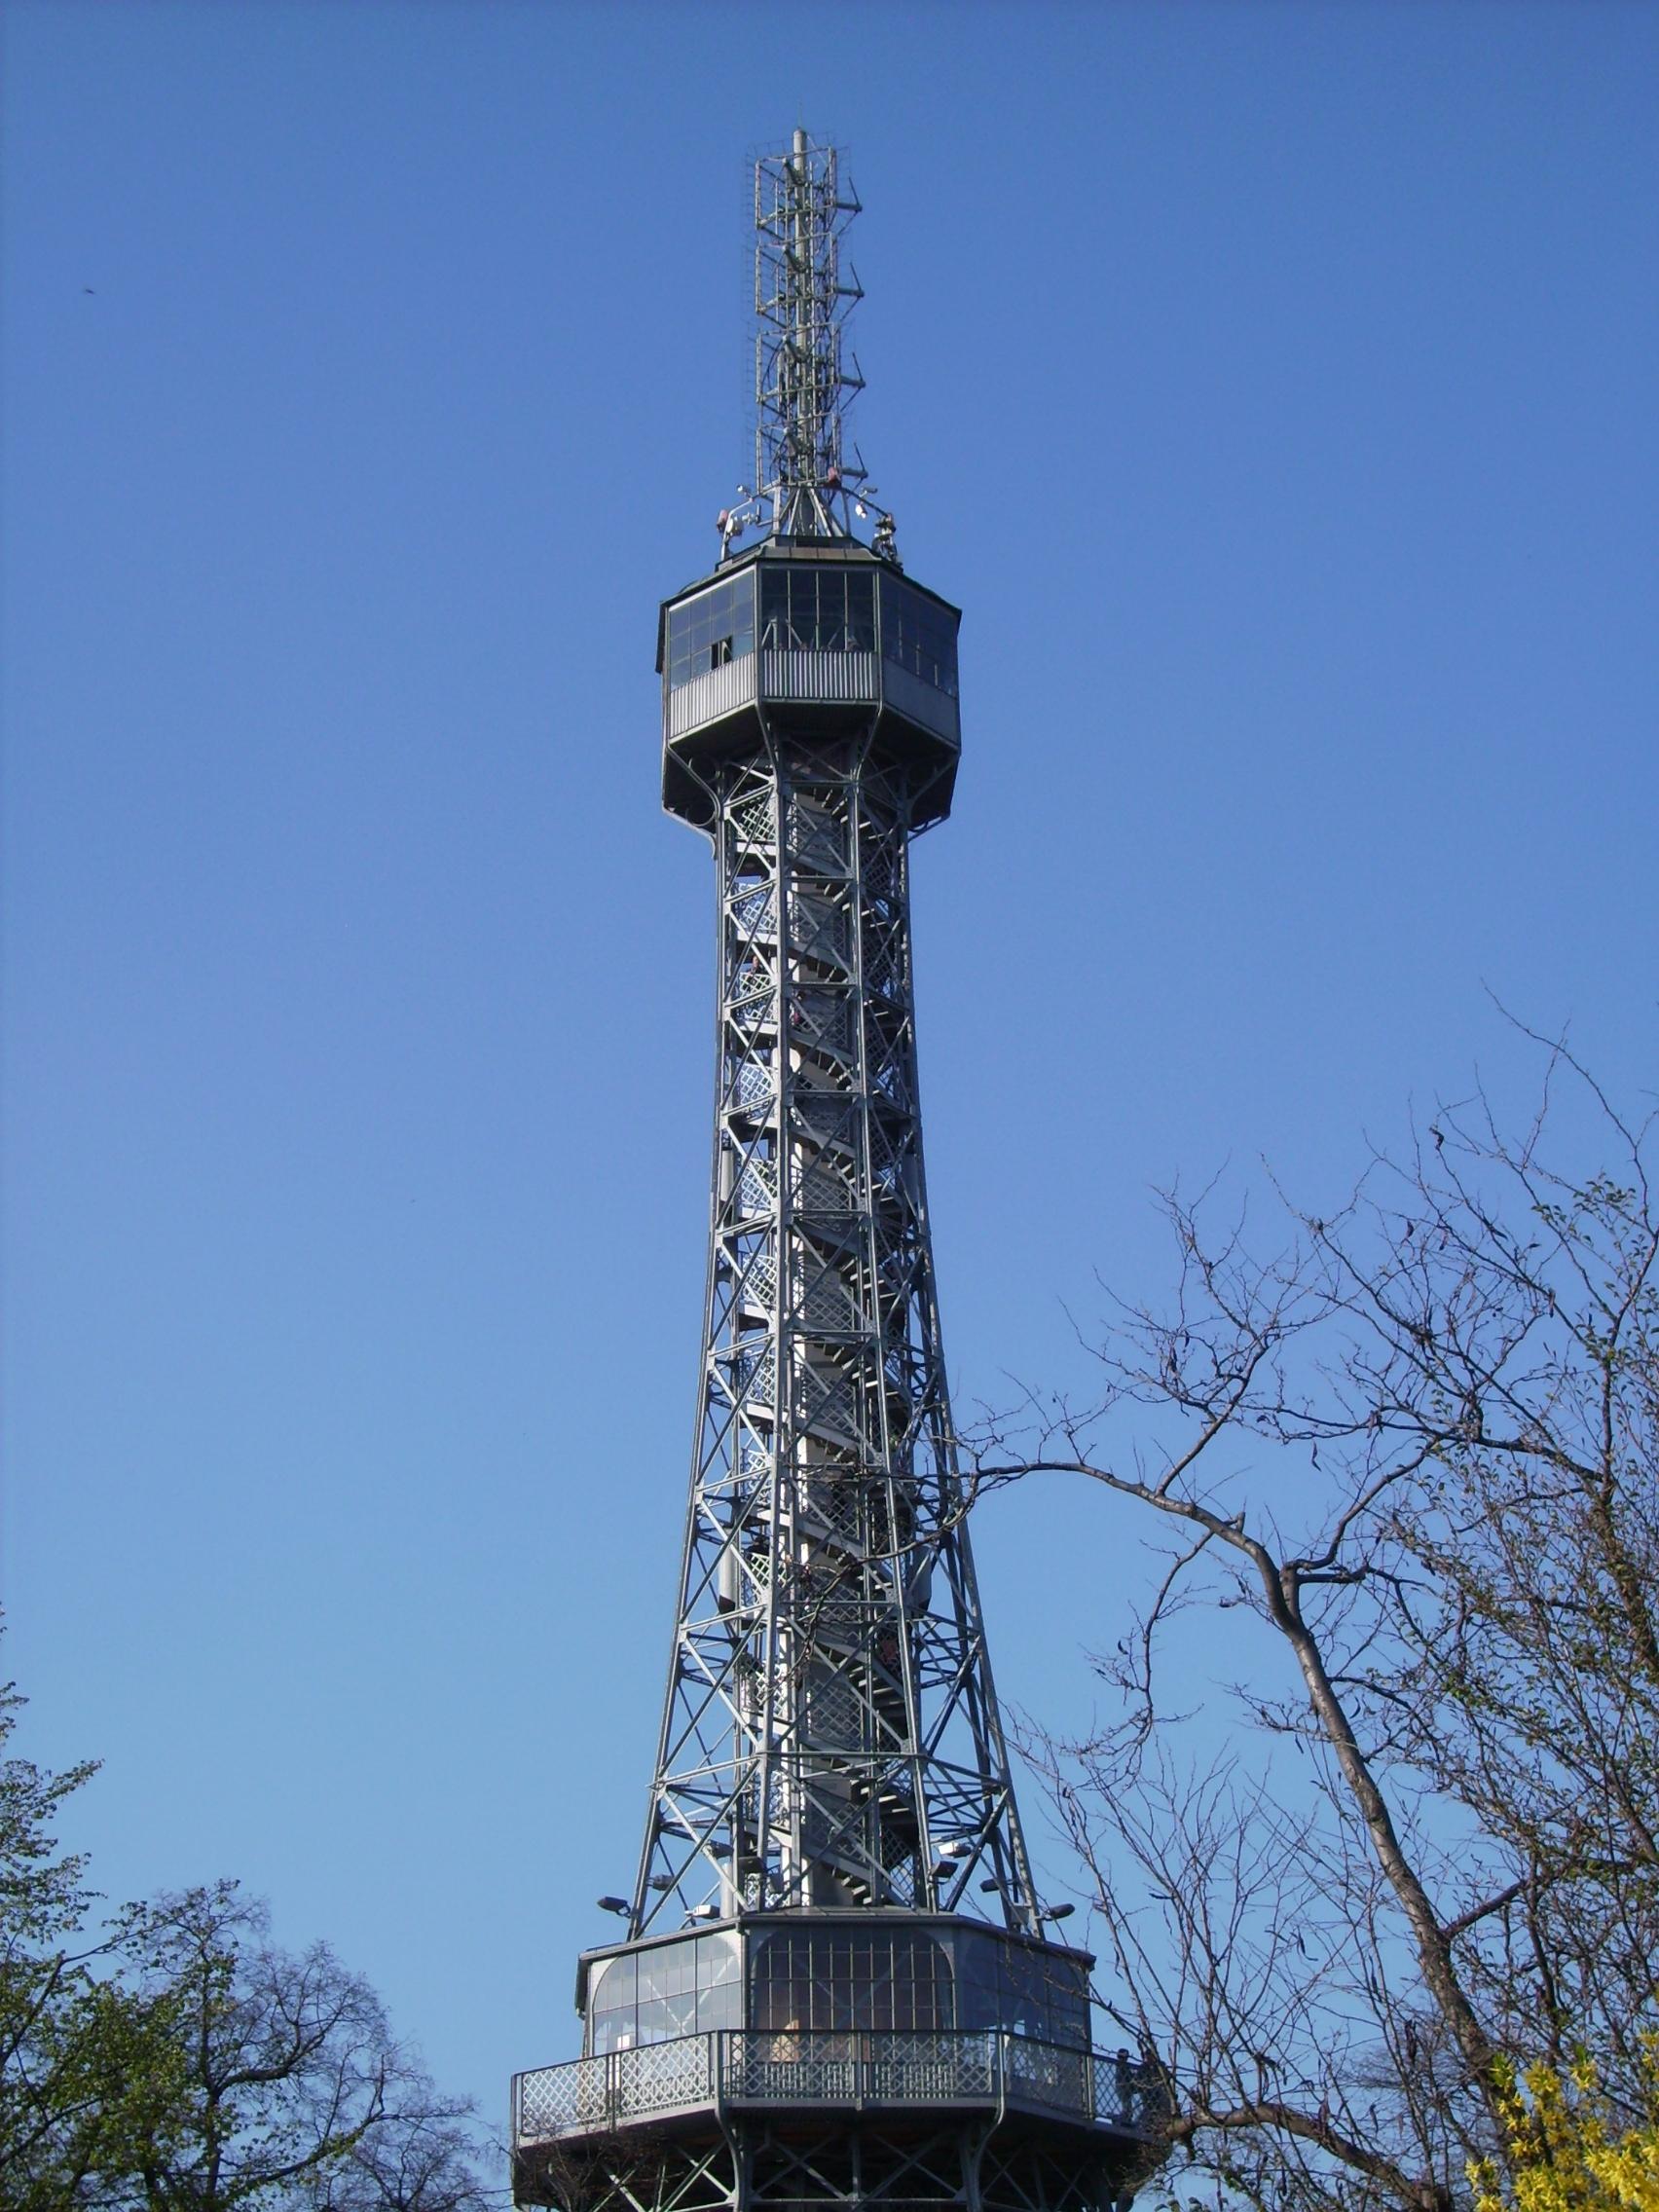 Petrín Tower (Rozhledna)